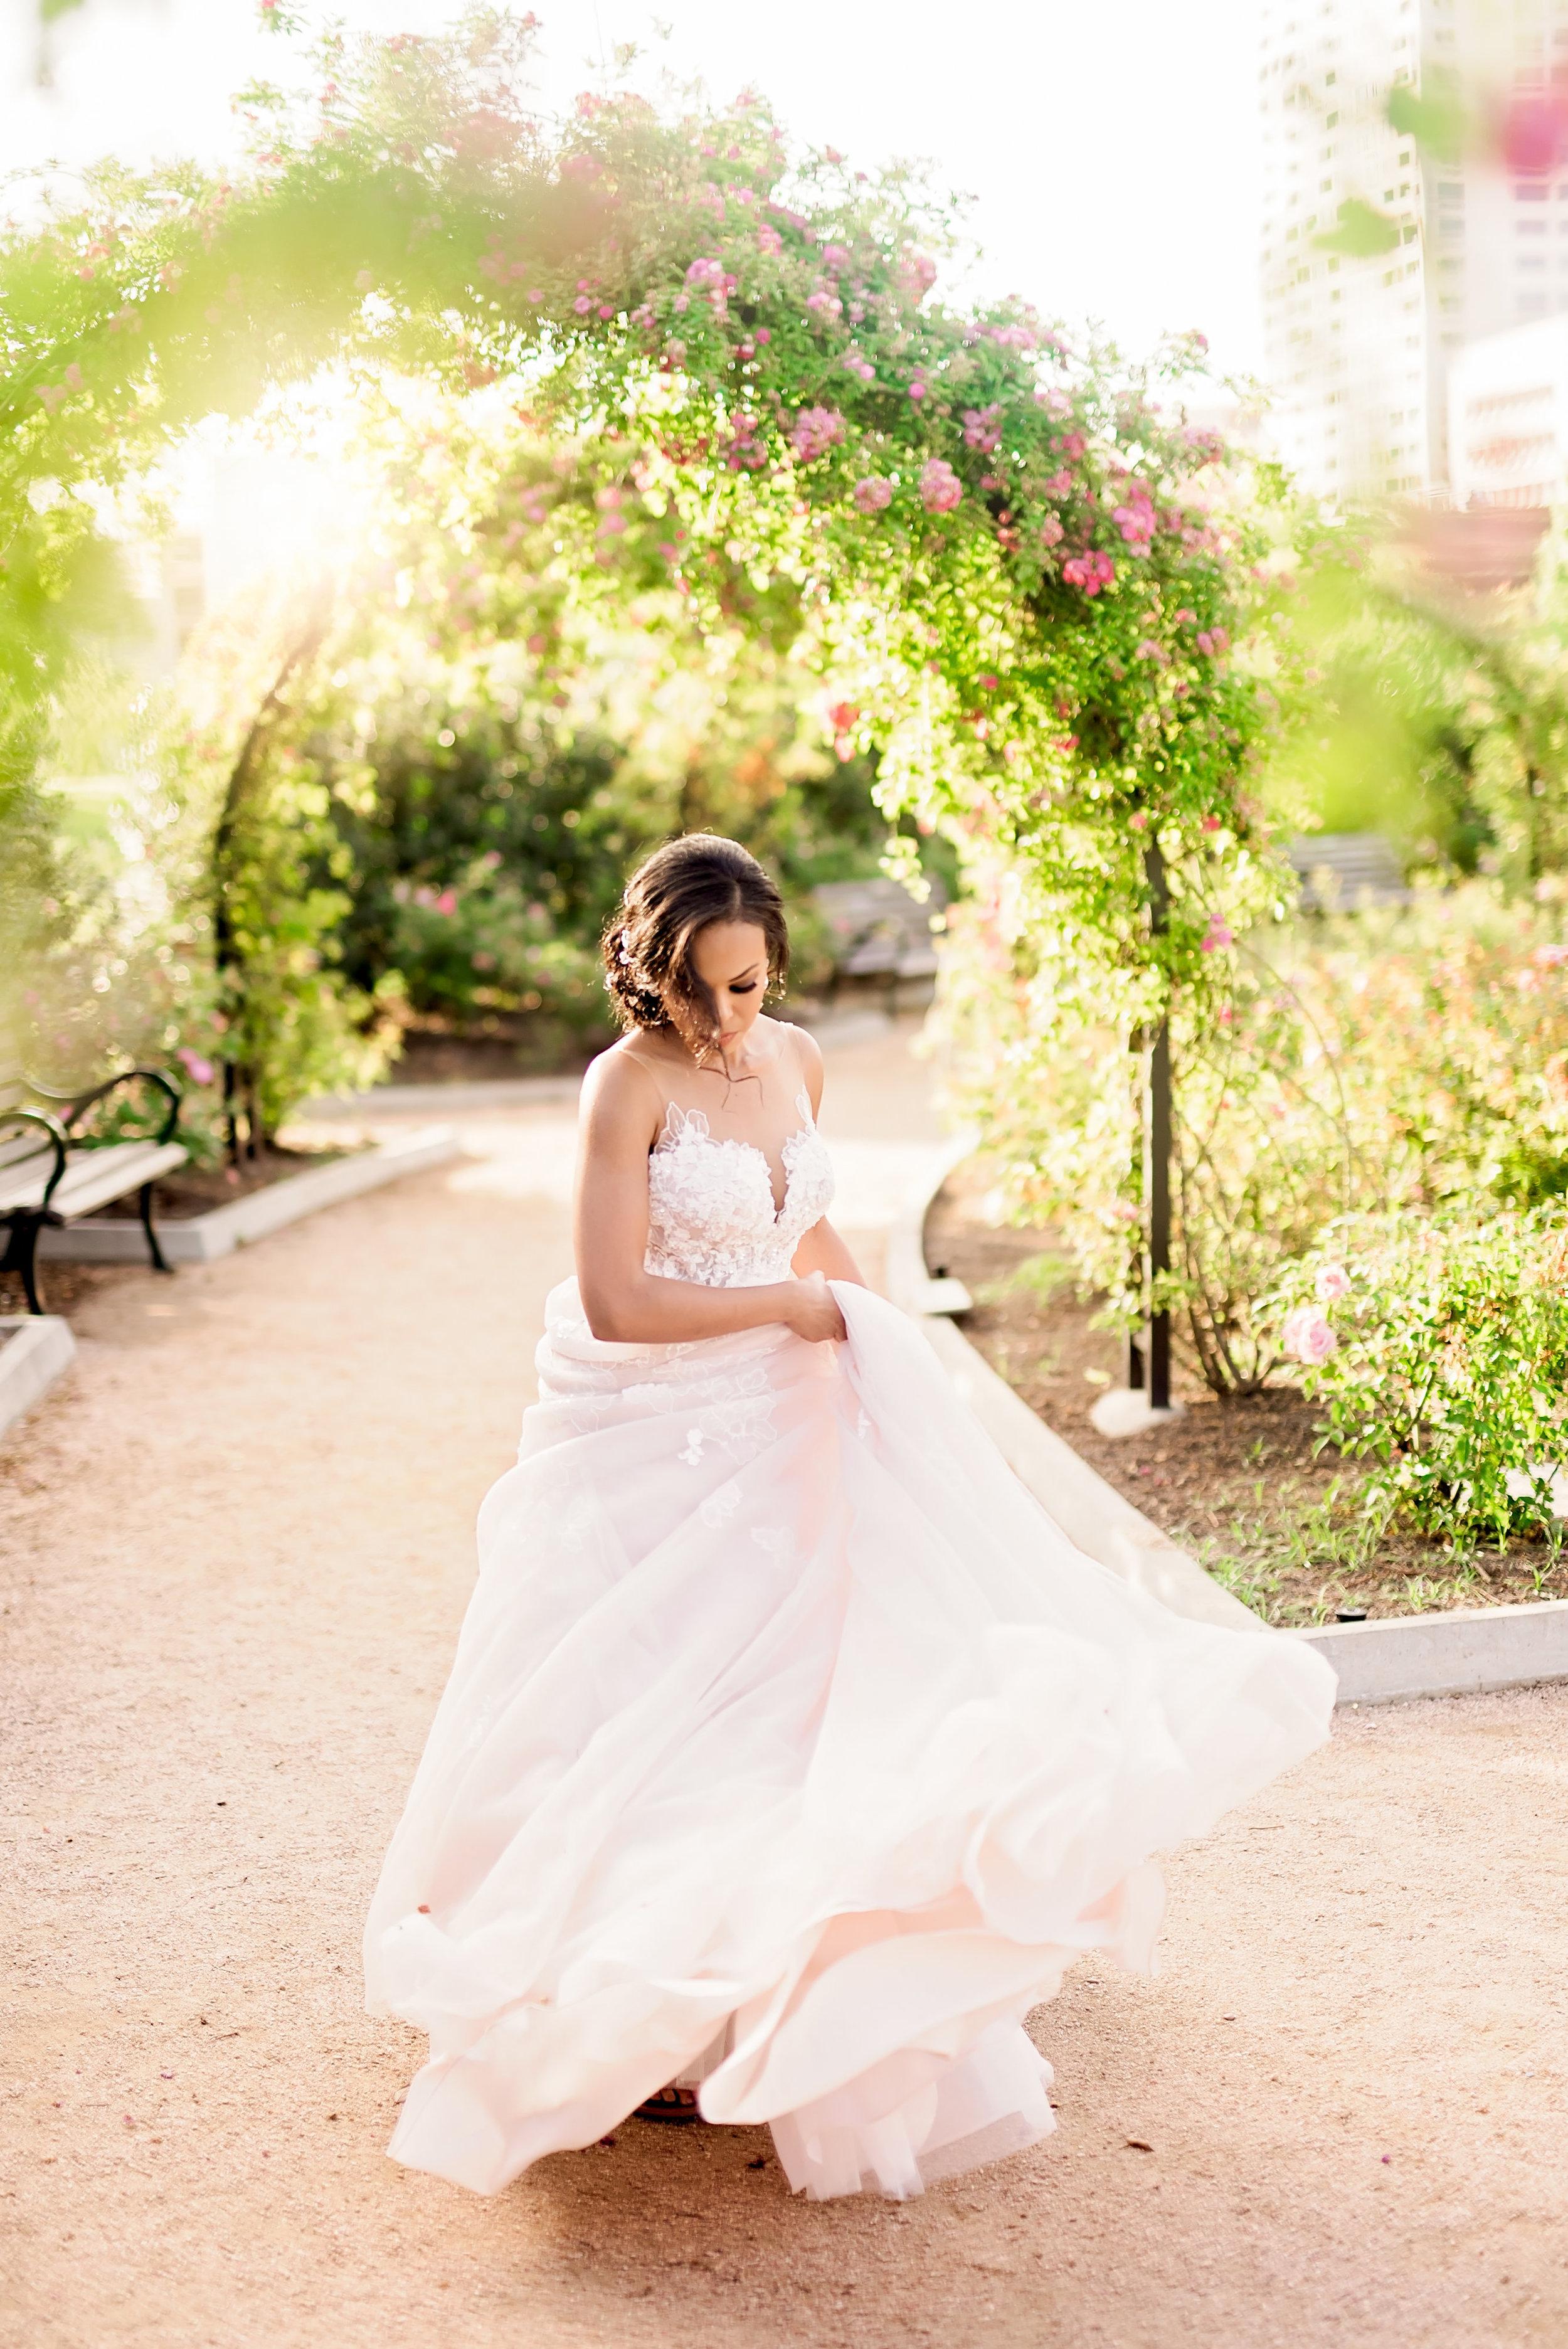 Taylor-bridal-Pharris-Photography-73.jpg